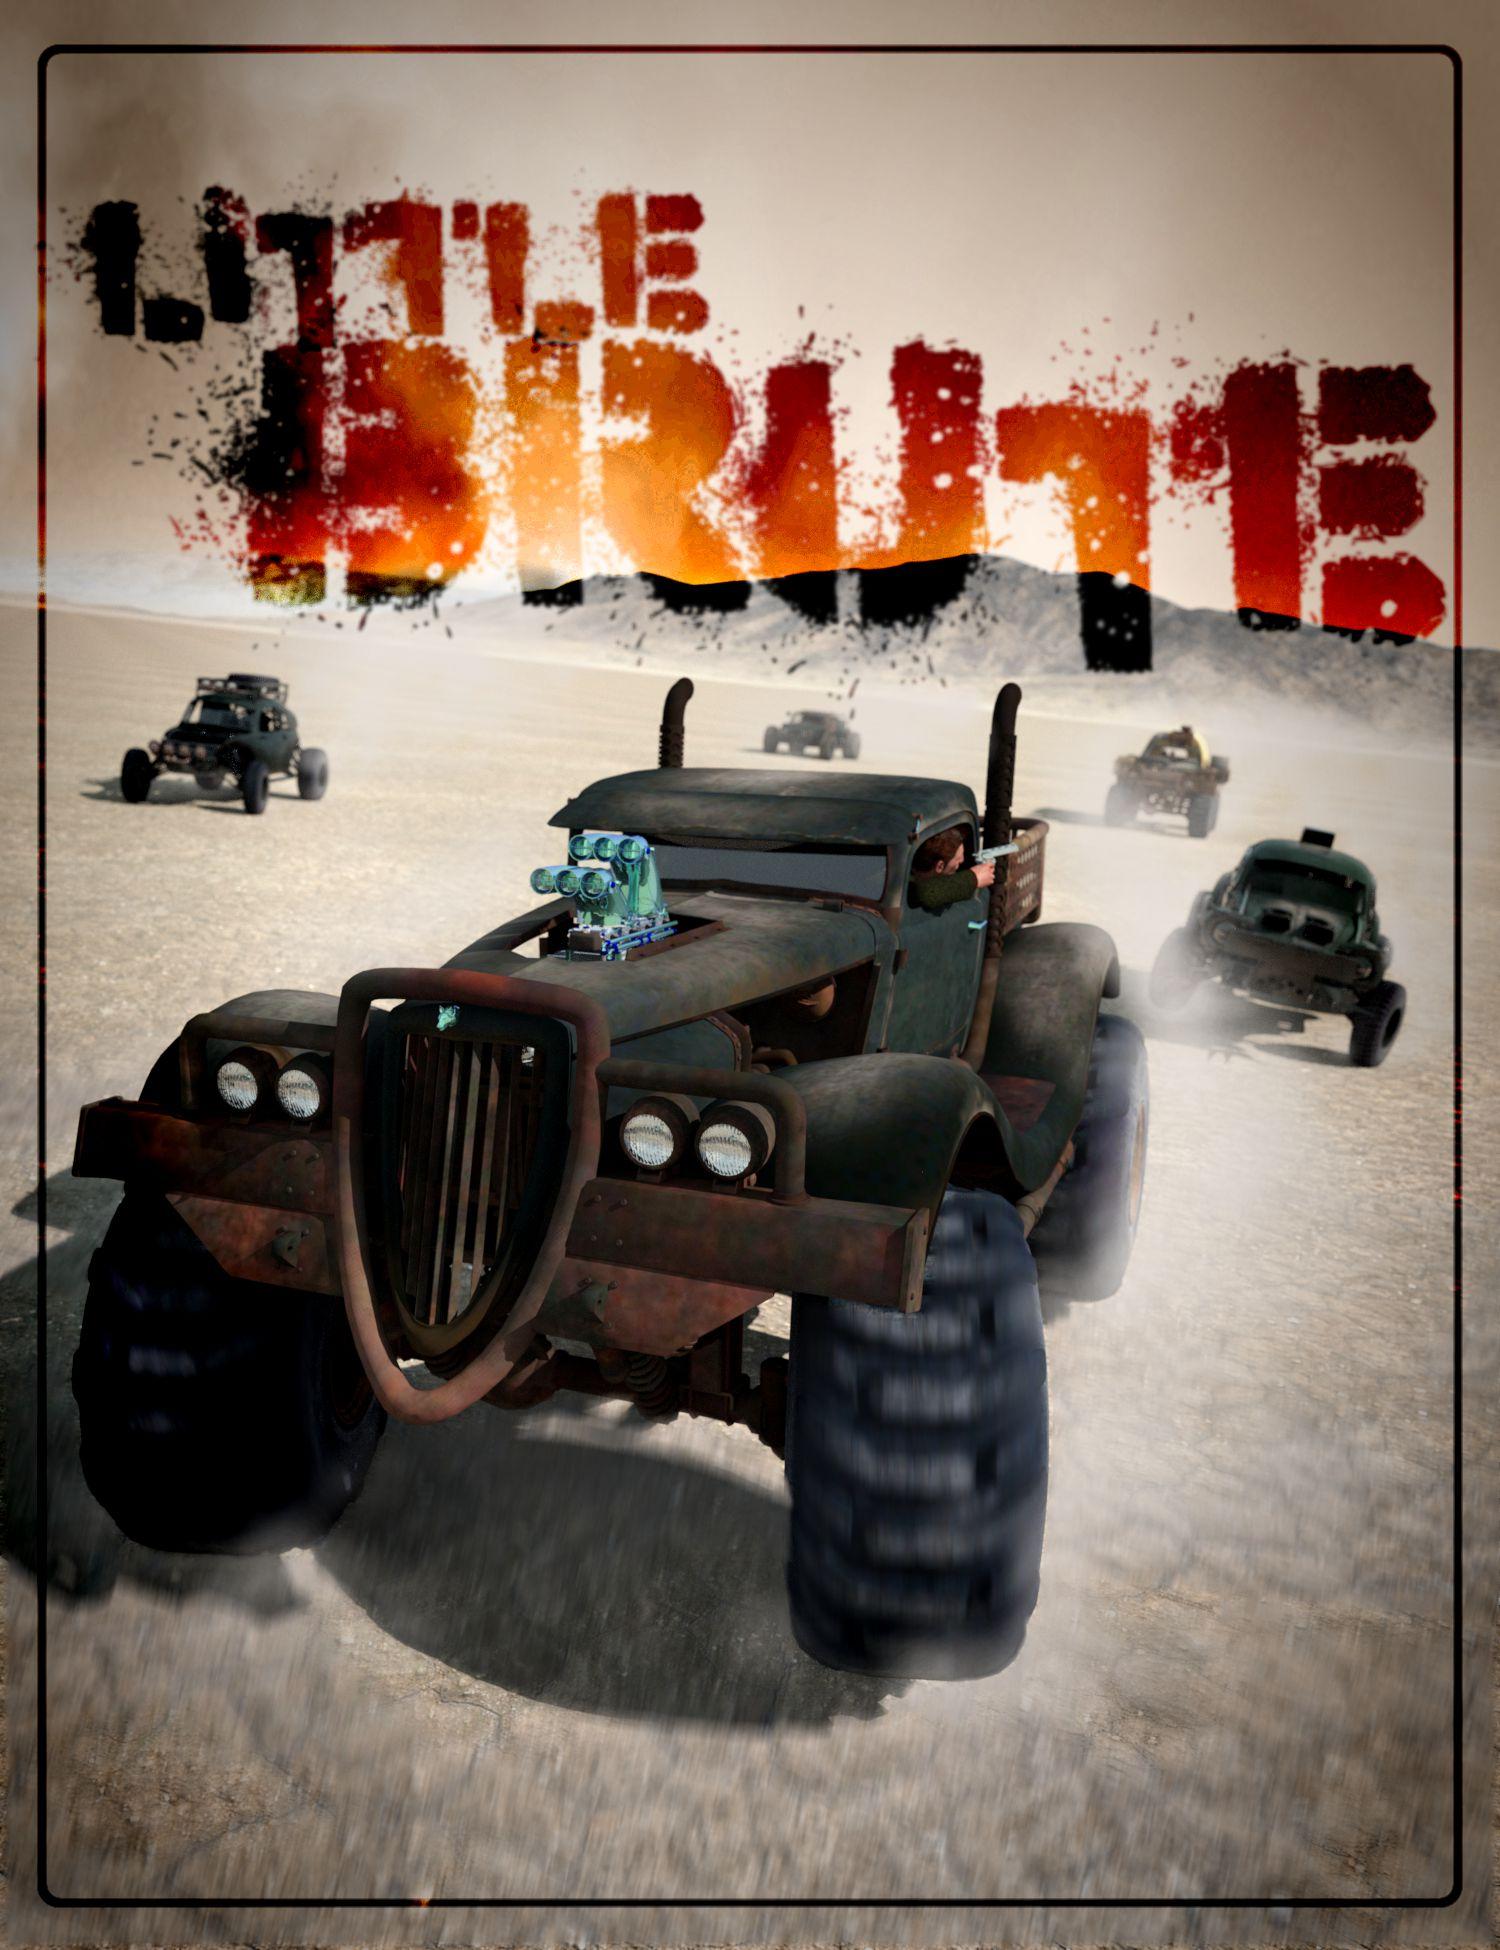 Little Brute by: DzFire, 3D Models by Daz 3D